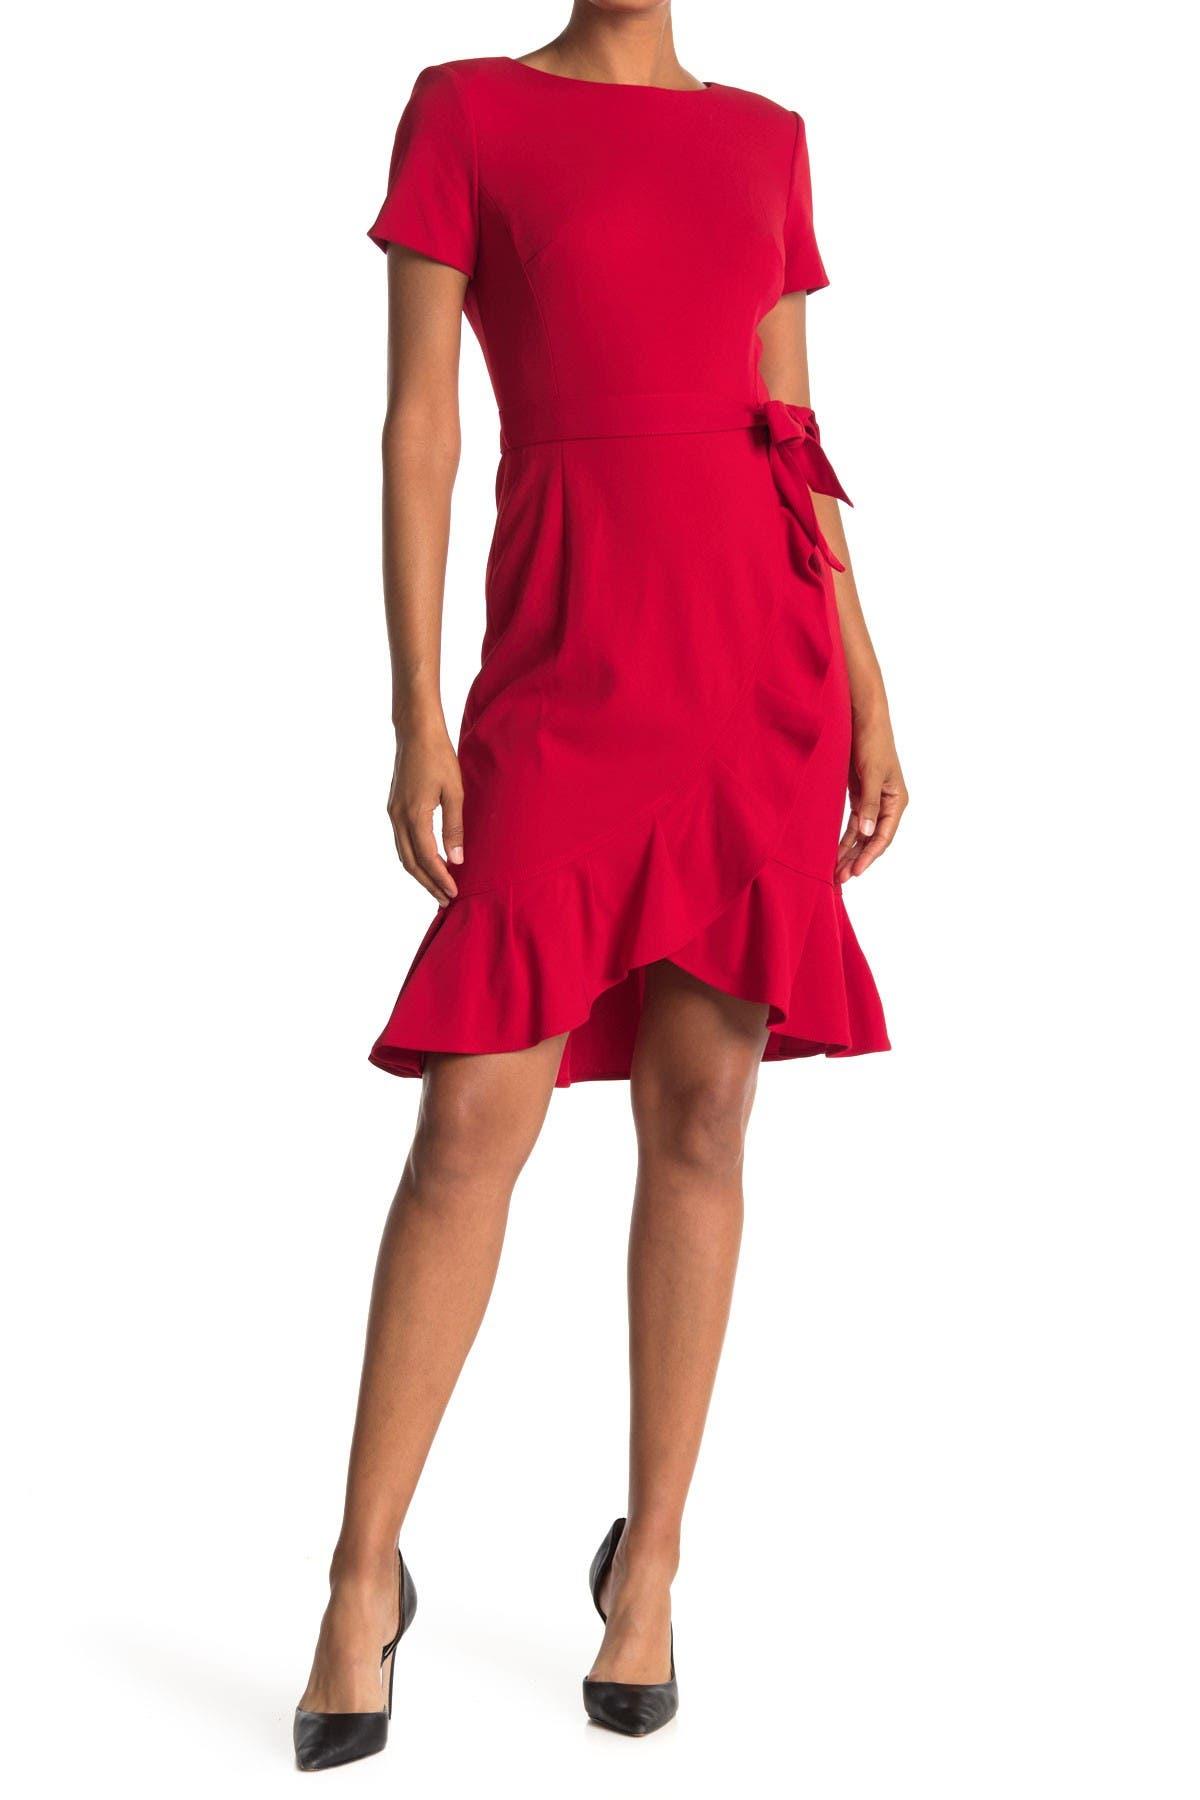 Image of Calvin Klein Belted Ruffle Hem Dress